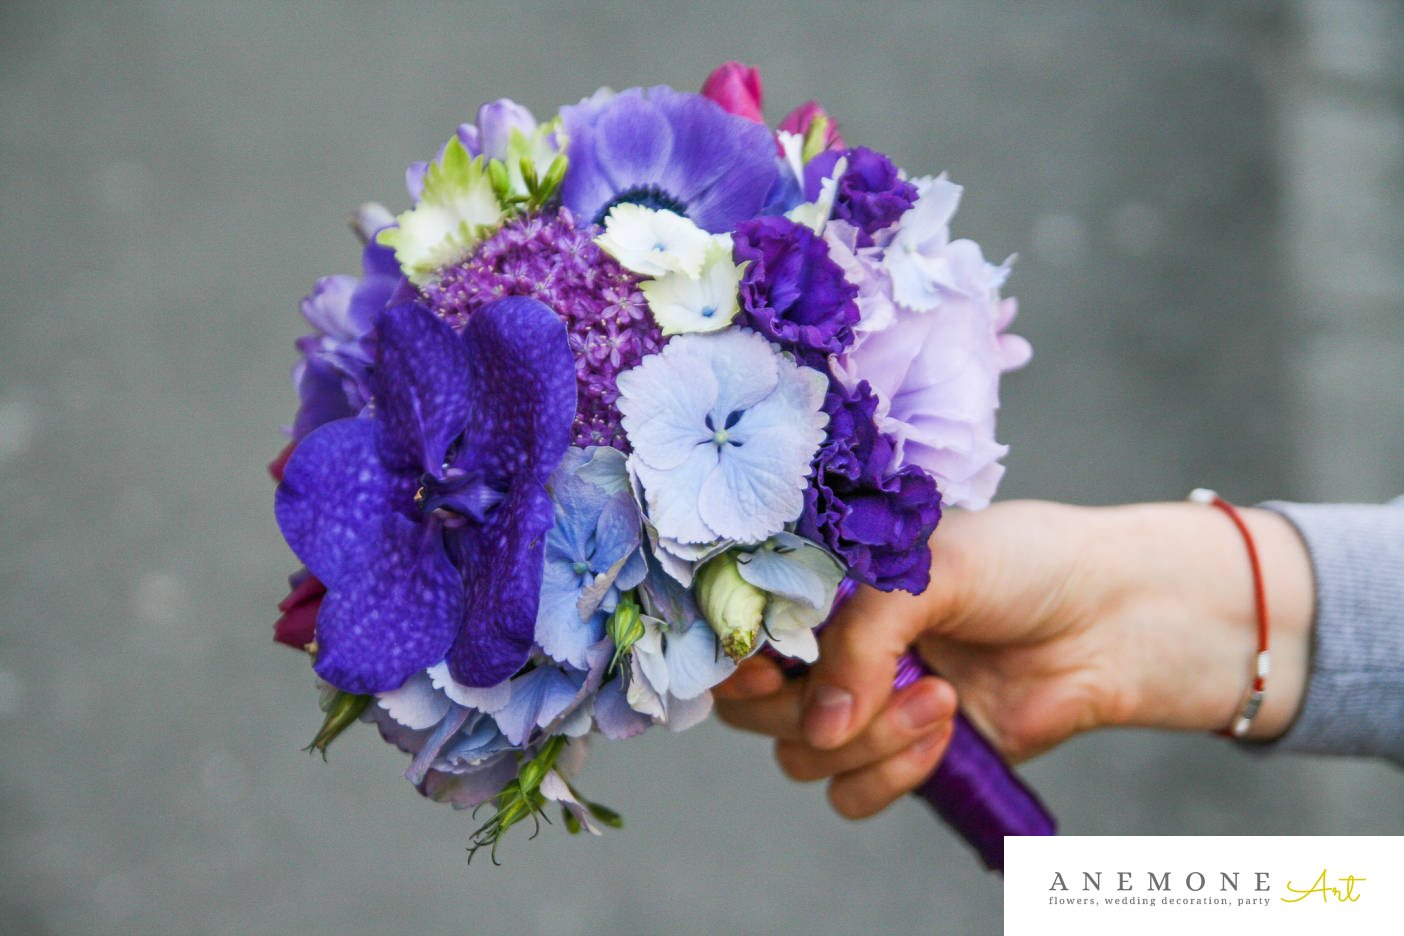 Poza, foto cu Flori de nunta buchet mireasa, hortensia, lisianthus, orhidee in Arad, Timisoara, Oradea (wedding flowers, bouquets) nunta Arad, Timisoara, Oradea